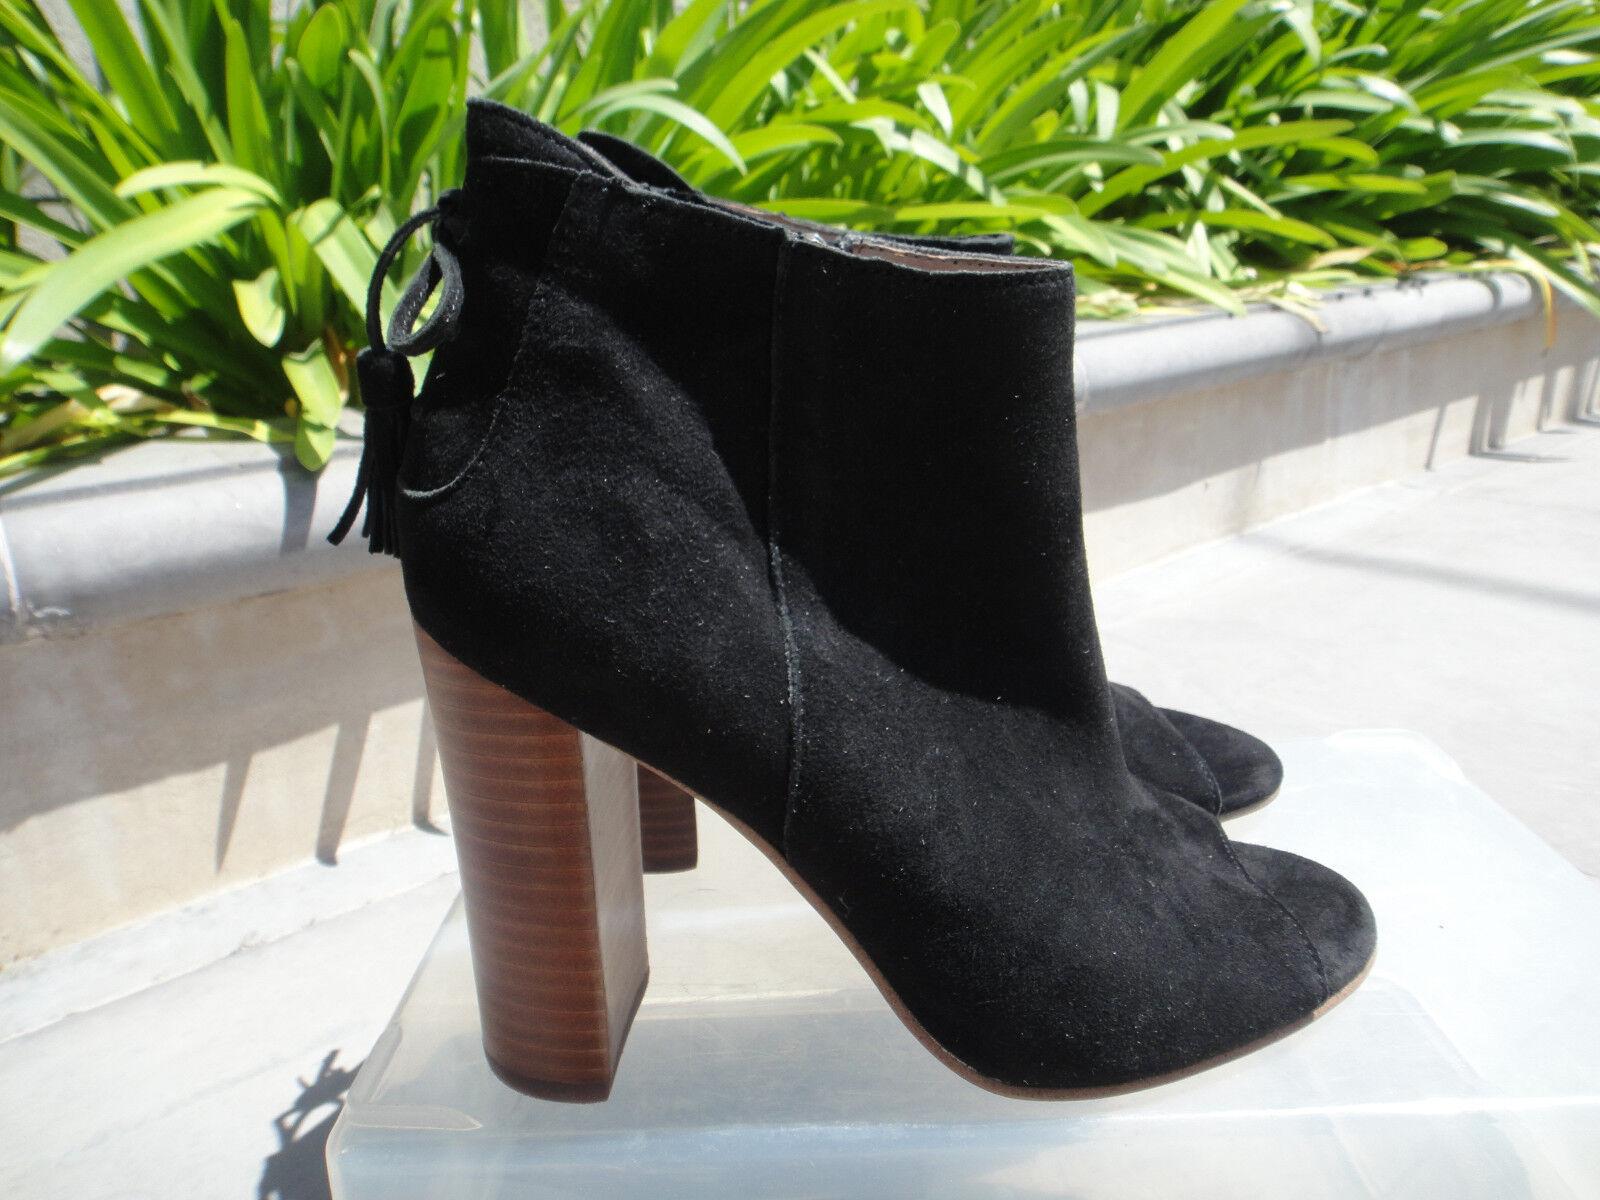 Halogen WARIN Open Toe Boot, Decorative Bow Back, Black Suede US Sz 9M, NWOT